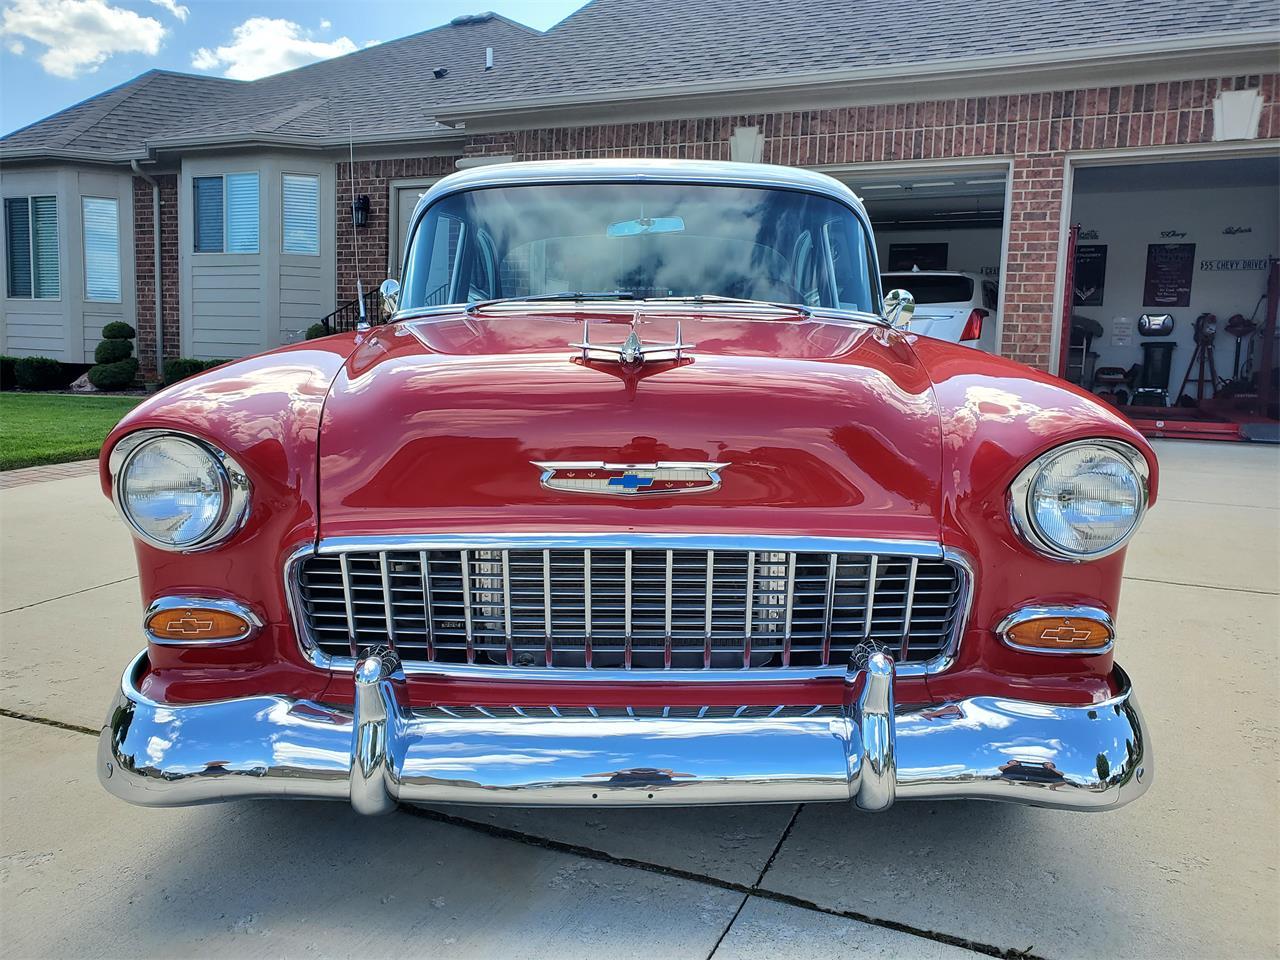 1955 Chevrolet Bel Air (CC-1253031) for sale in Macomb, Michigan